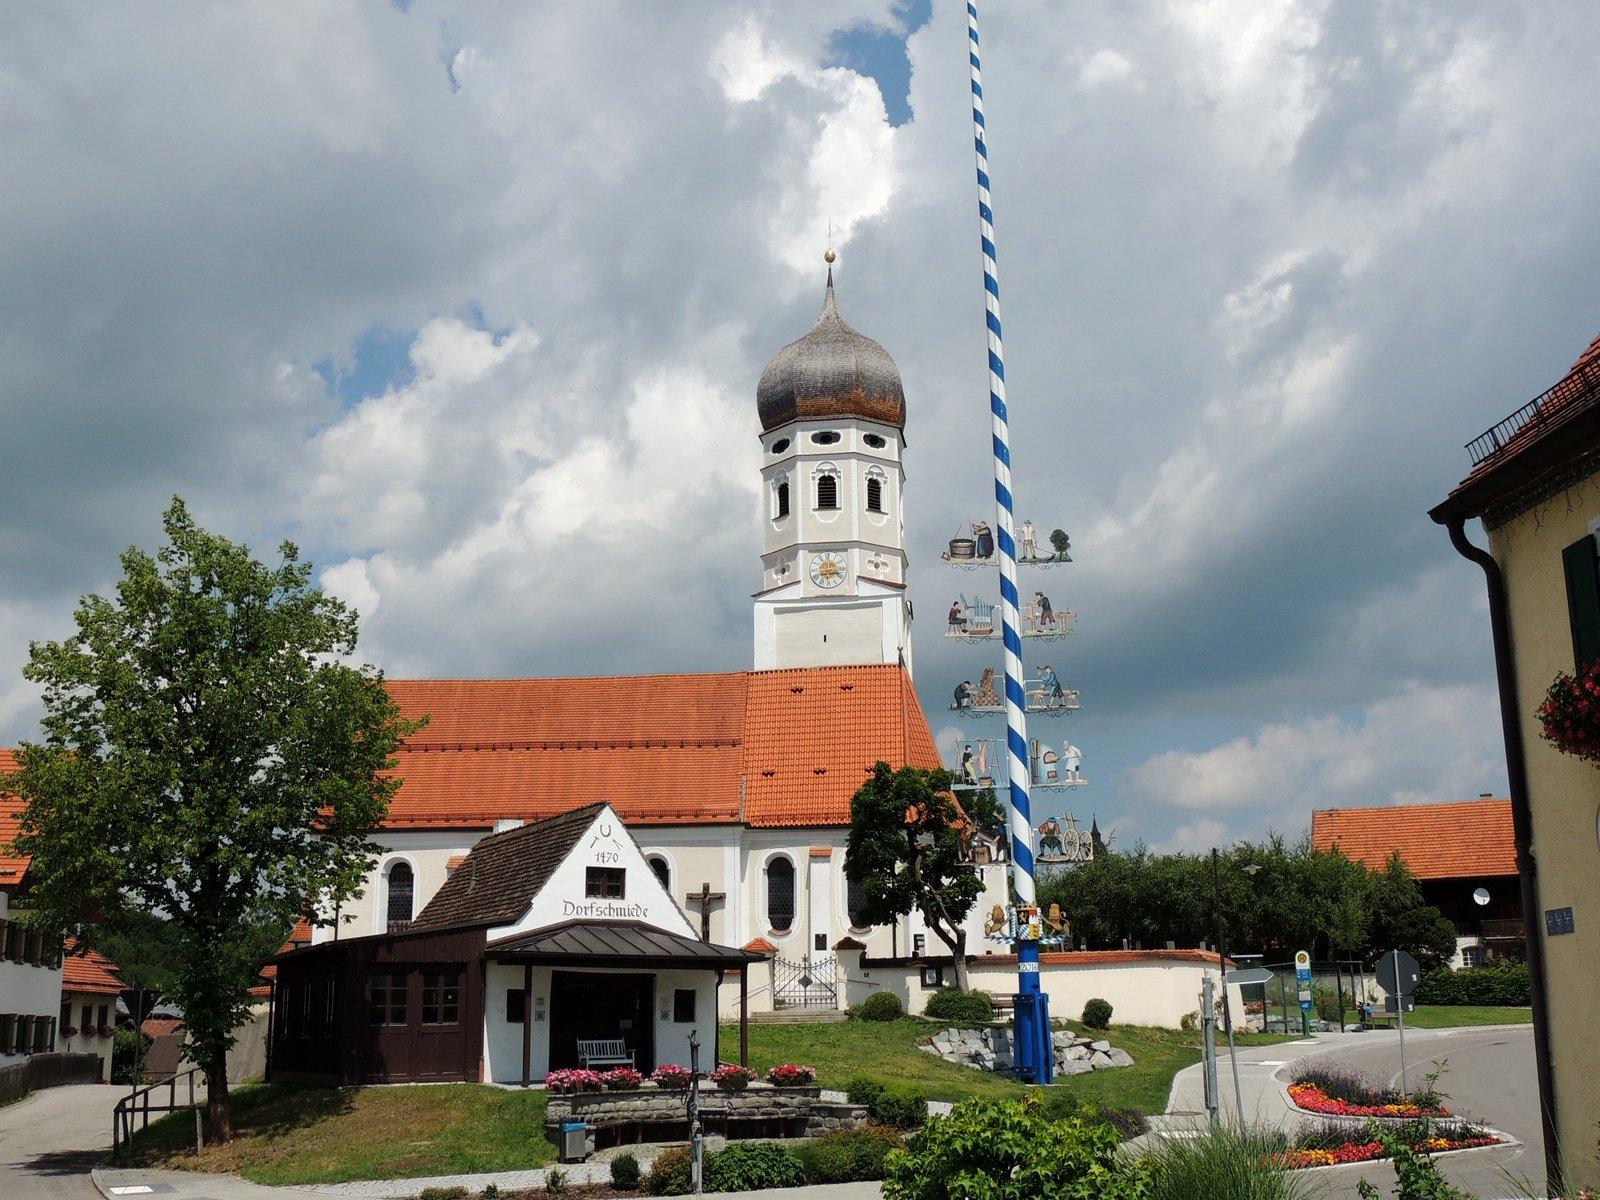 St. Vitus in Erling